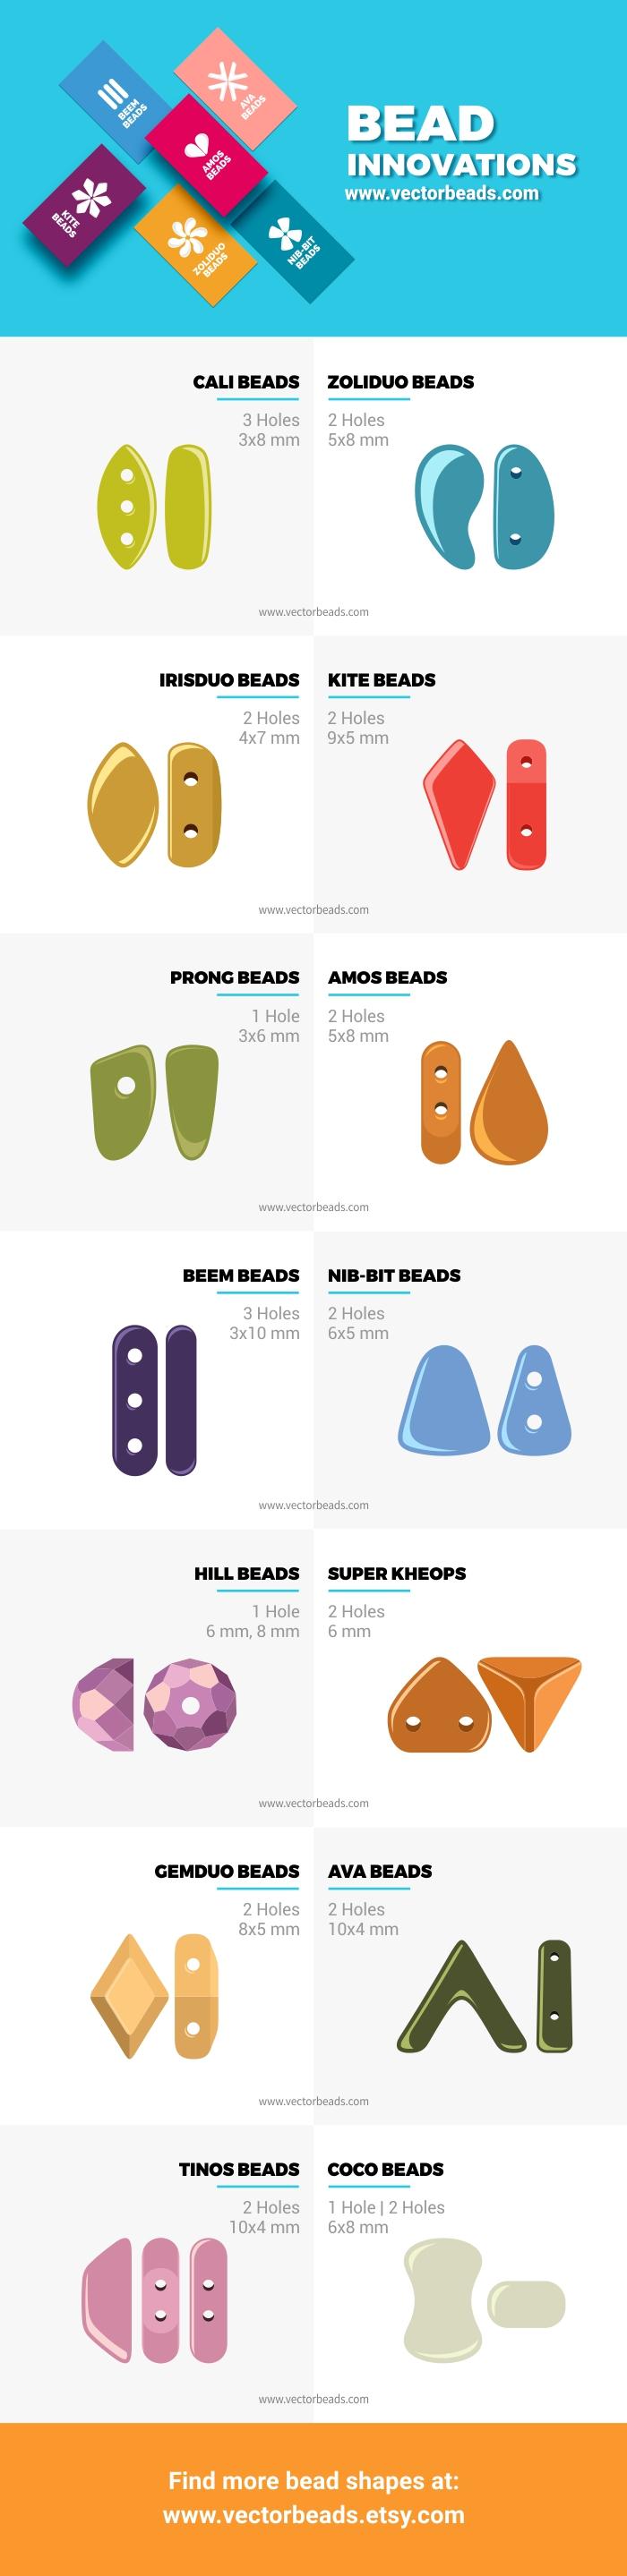 Bead Innovations